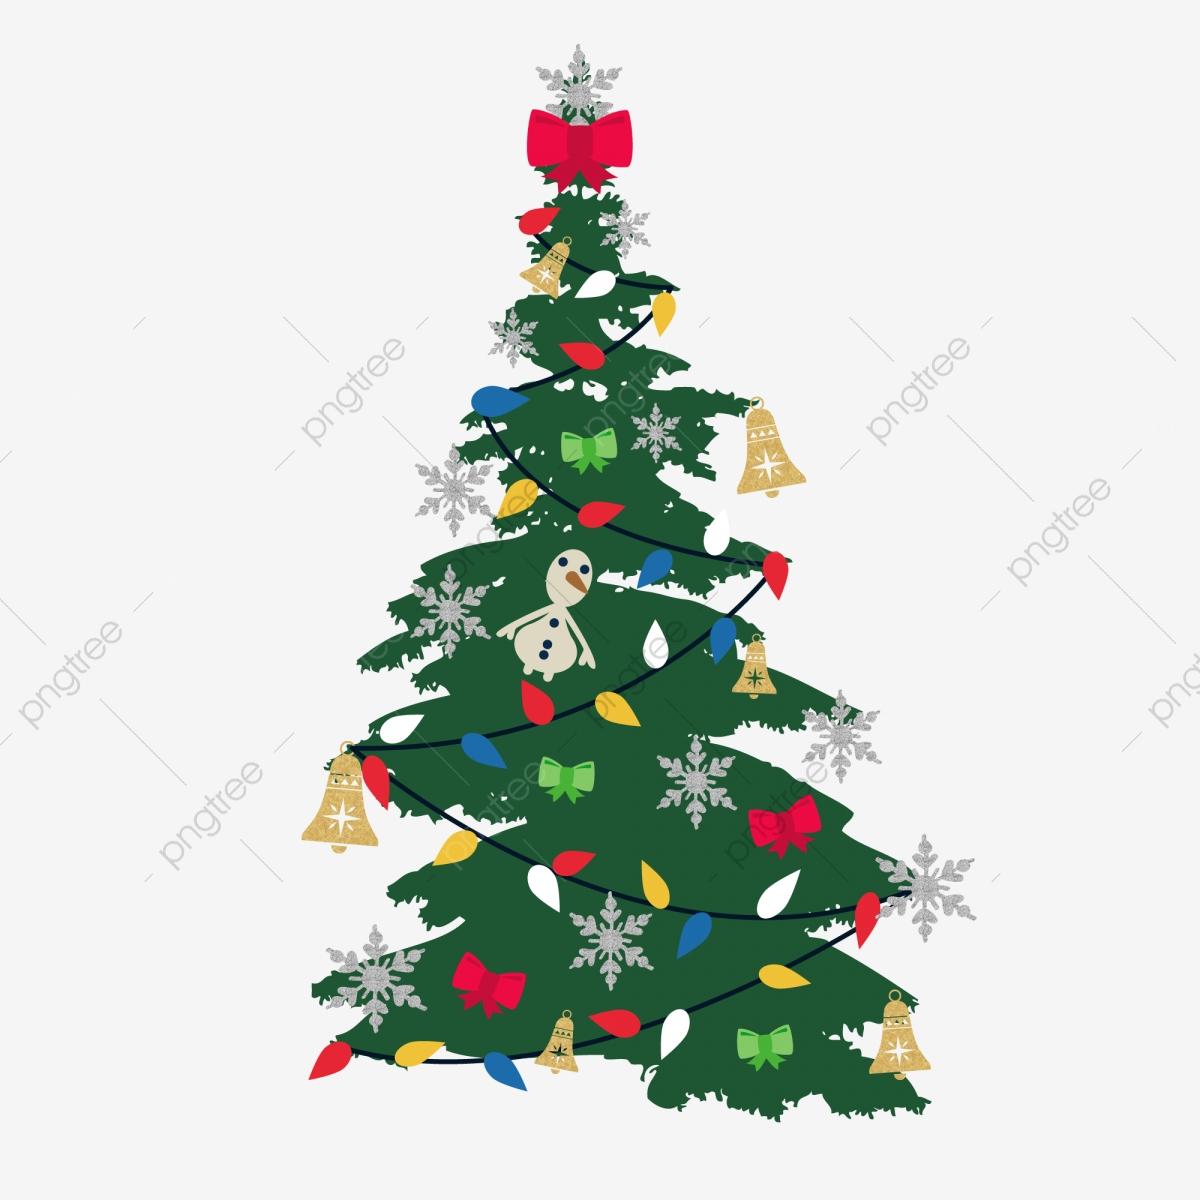 Christmas Green Hanging Lights Bow Bells Snowflakes Tree, Christmas.